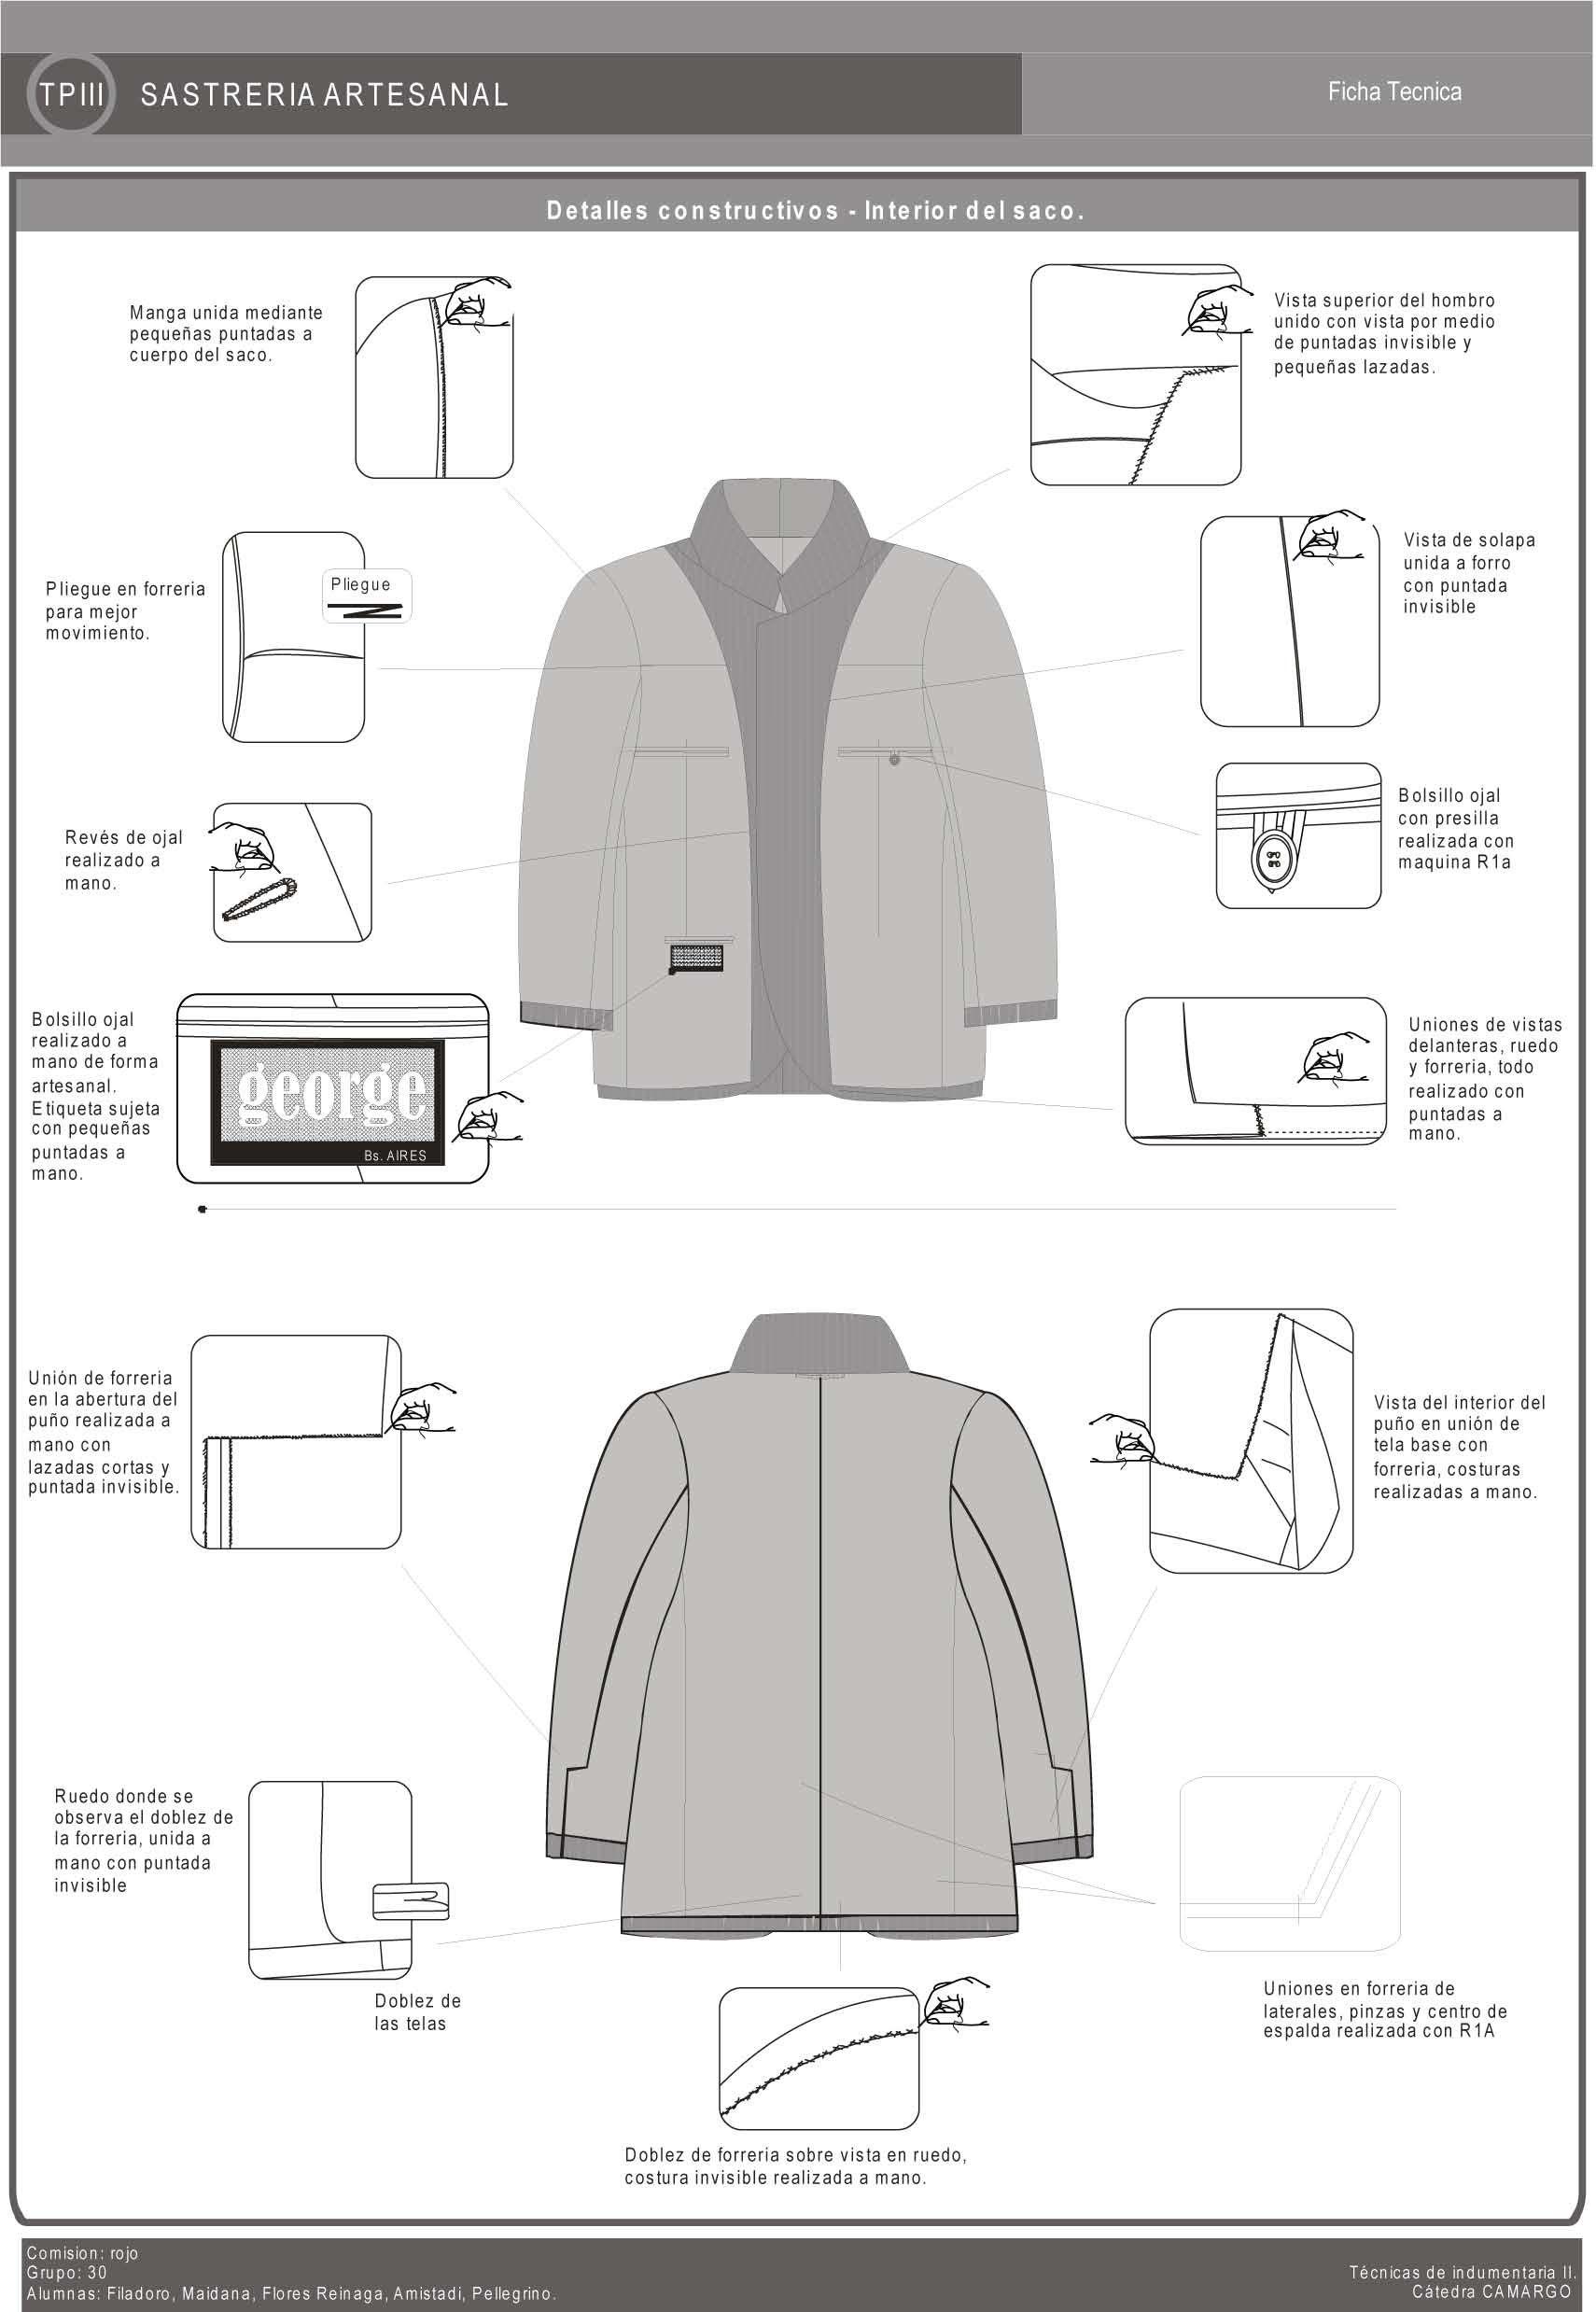 Pin de Alfredo Siles en Confección chaquetas | Pinterest | Costura ...